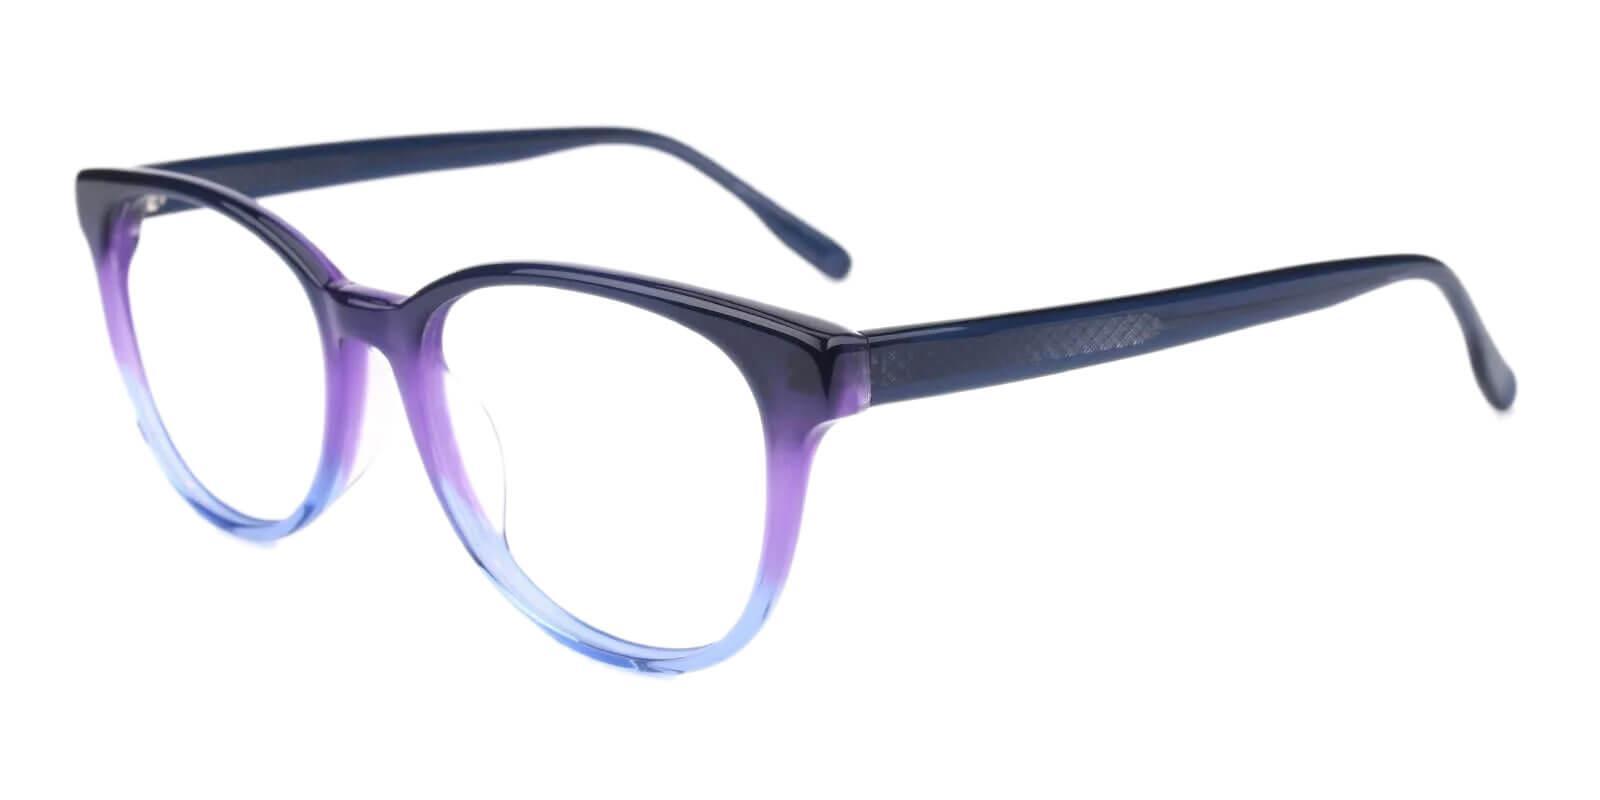 Bouquet Blue Acetate Eyeglasses , SpringHinges , UniversalBridgeFit Frames from ABBE Glasses